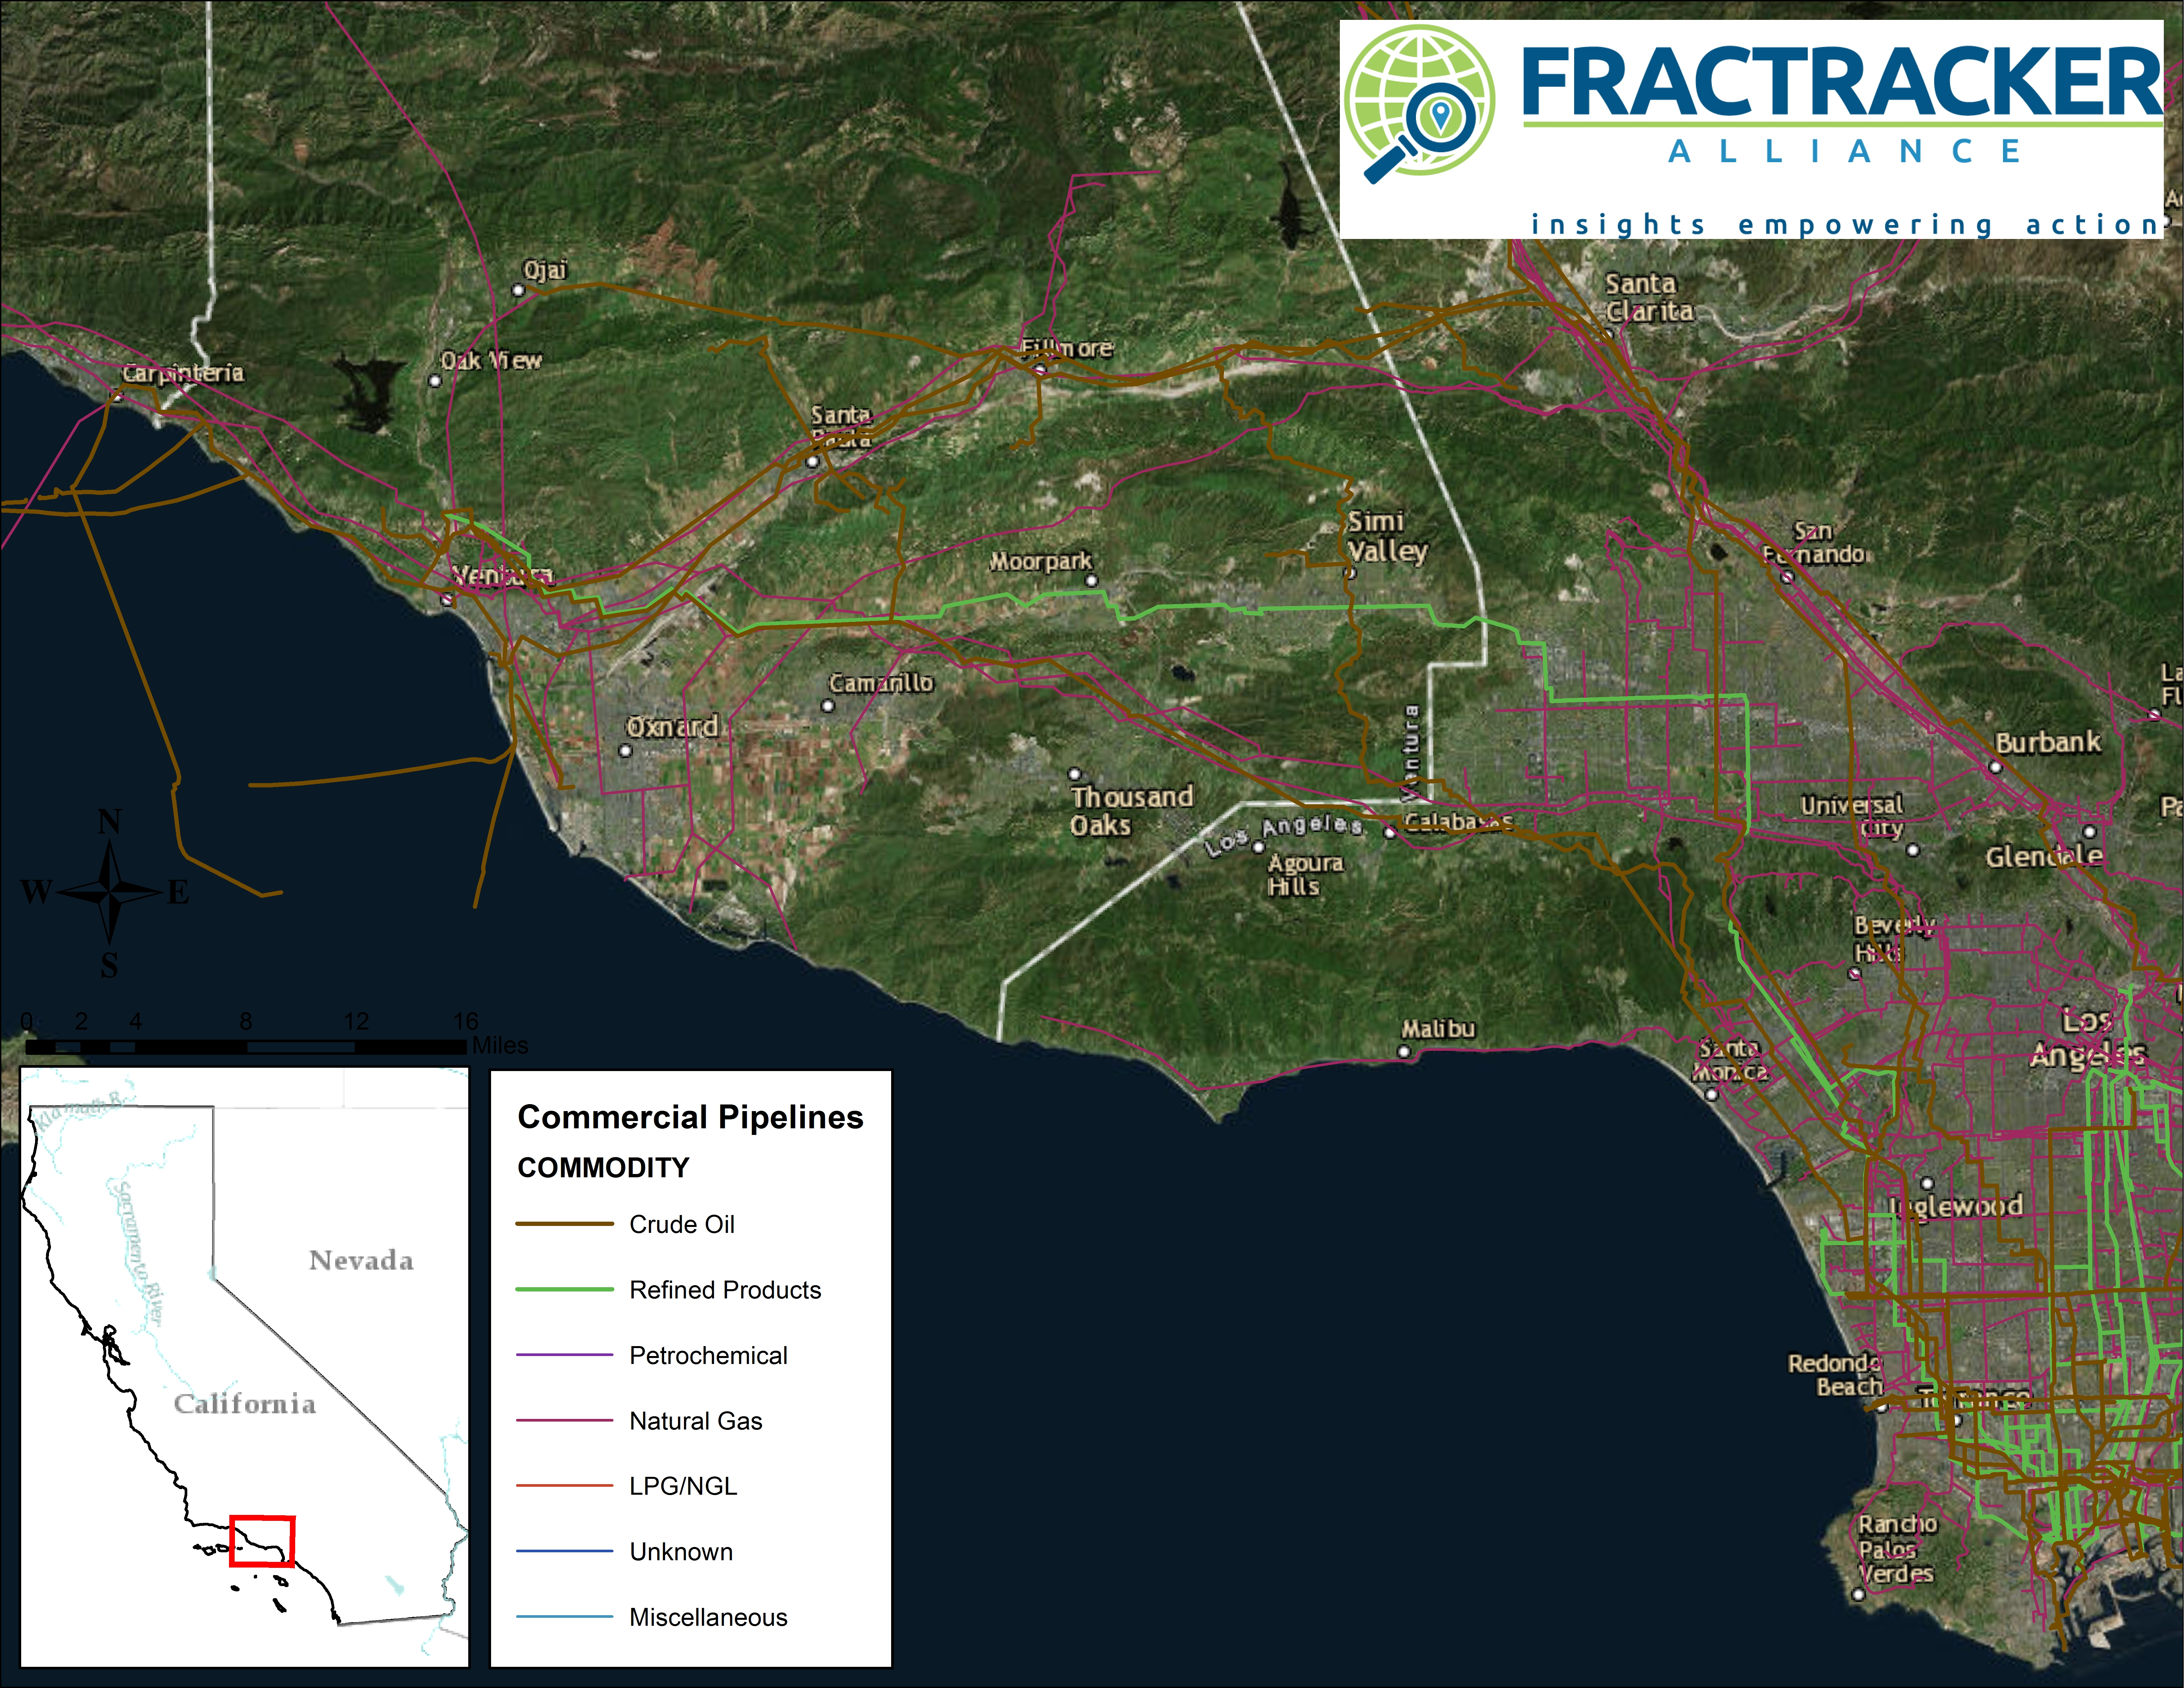 FT_Pipelines_Ventura